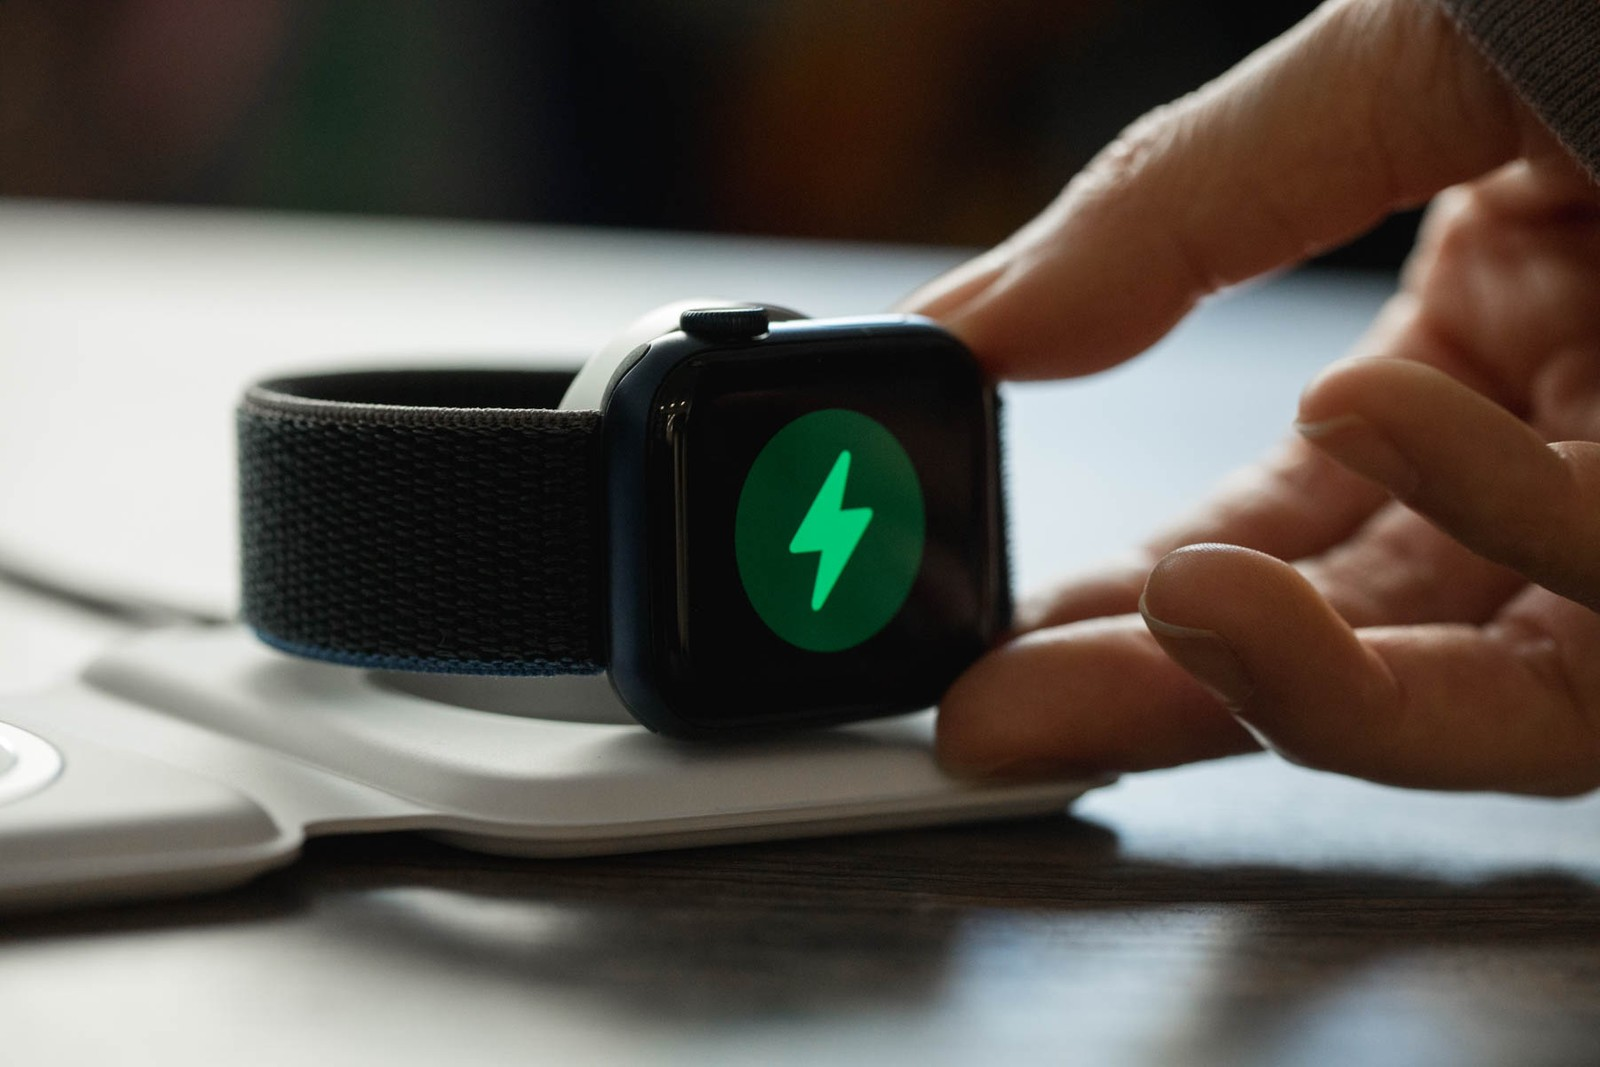 Apple MagSafe Duo Charger 雙充電器及全新 M1 型號 Macbook Air 一覽